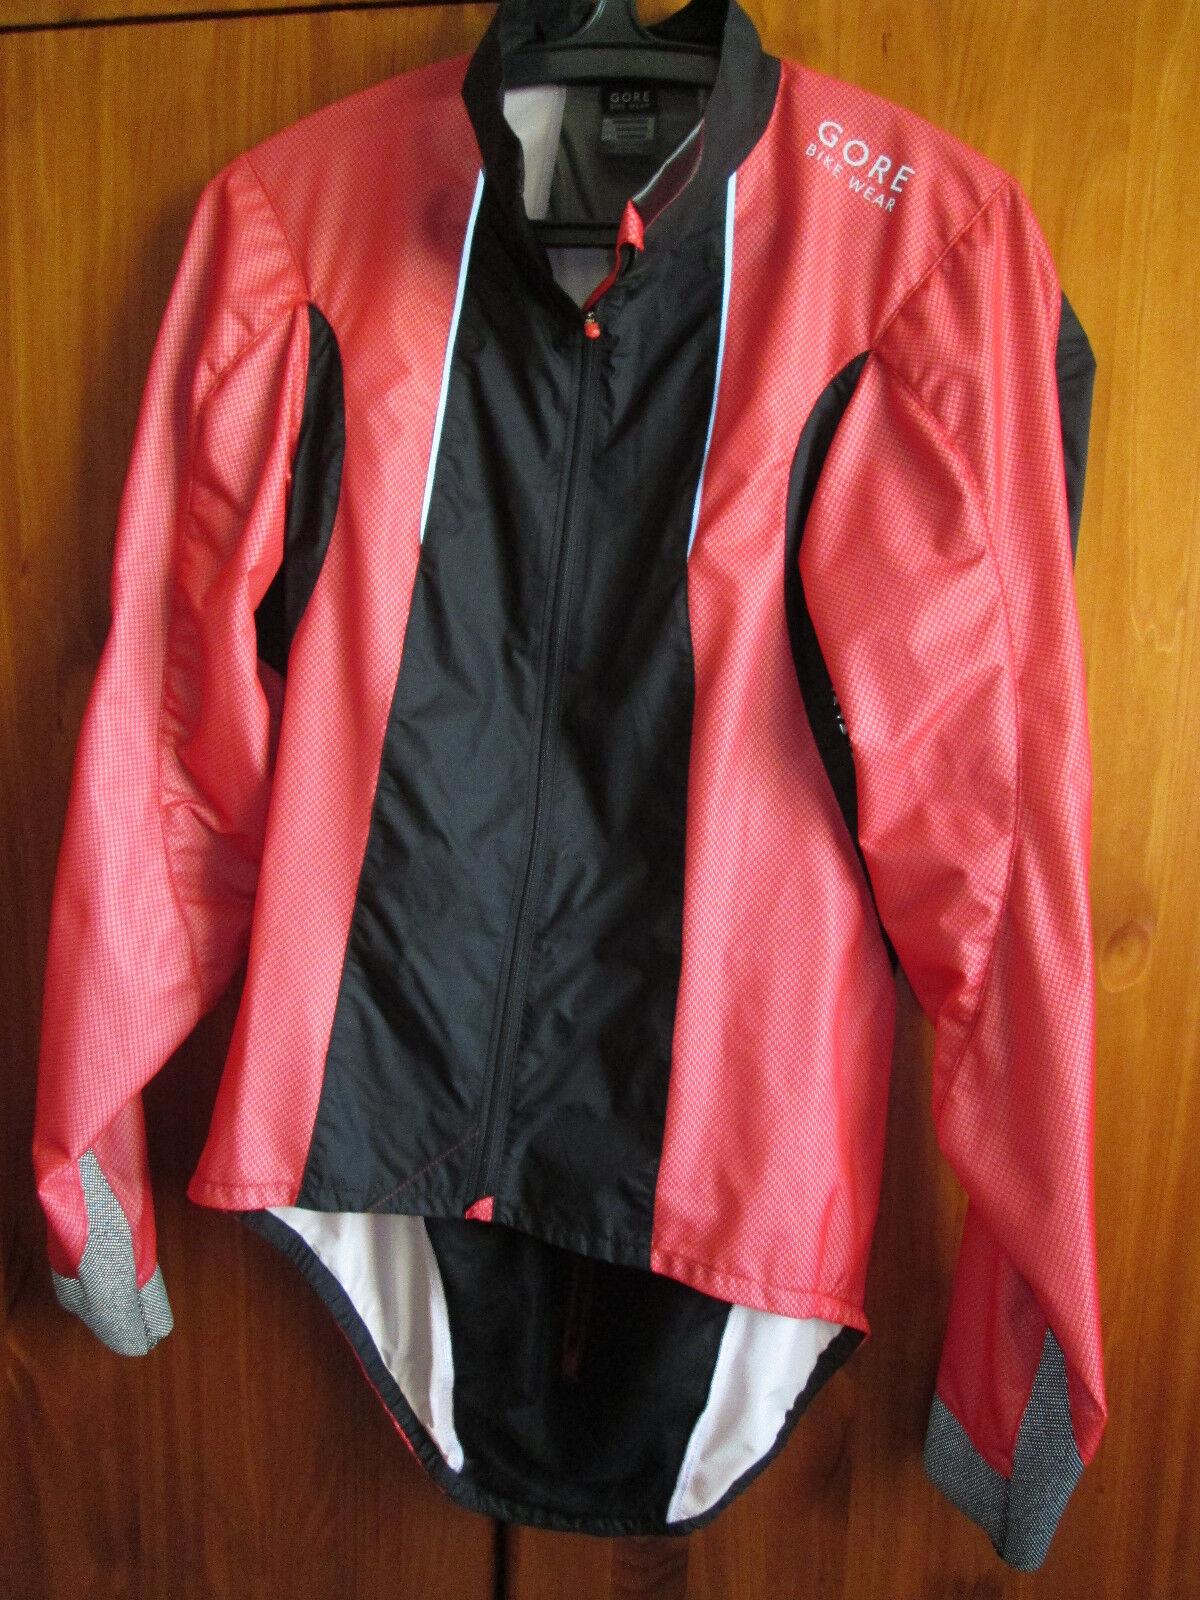 Größe S Gore Fahrrad Wear Xenon 2.0 Radfahren Laufen WindStopper Jacket, Full Zipp